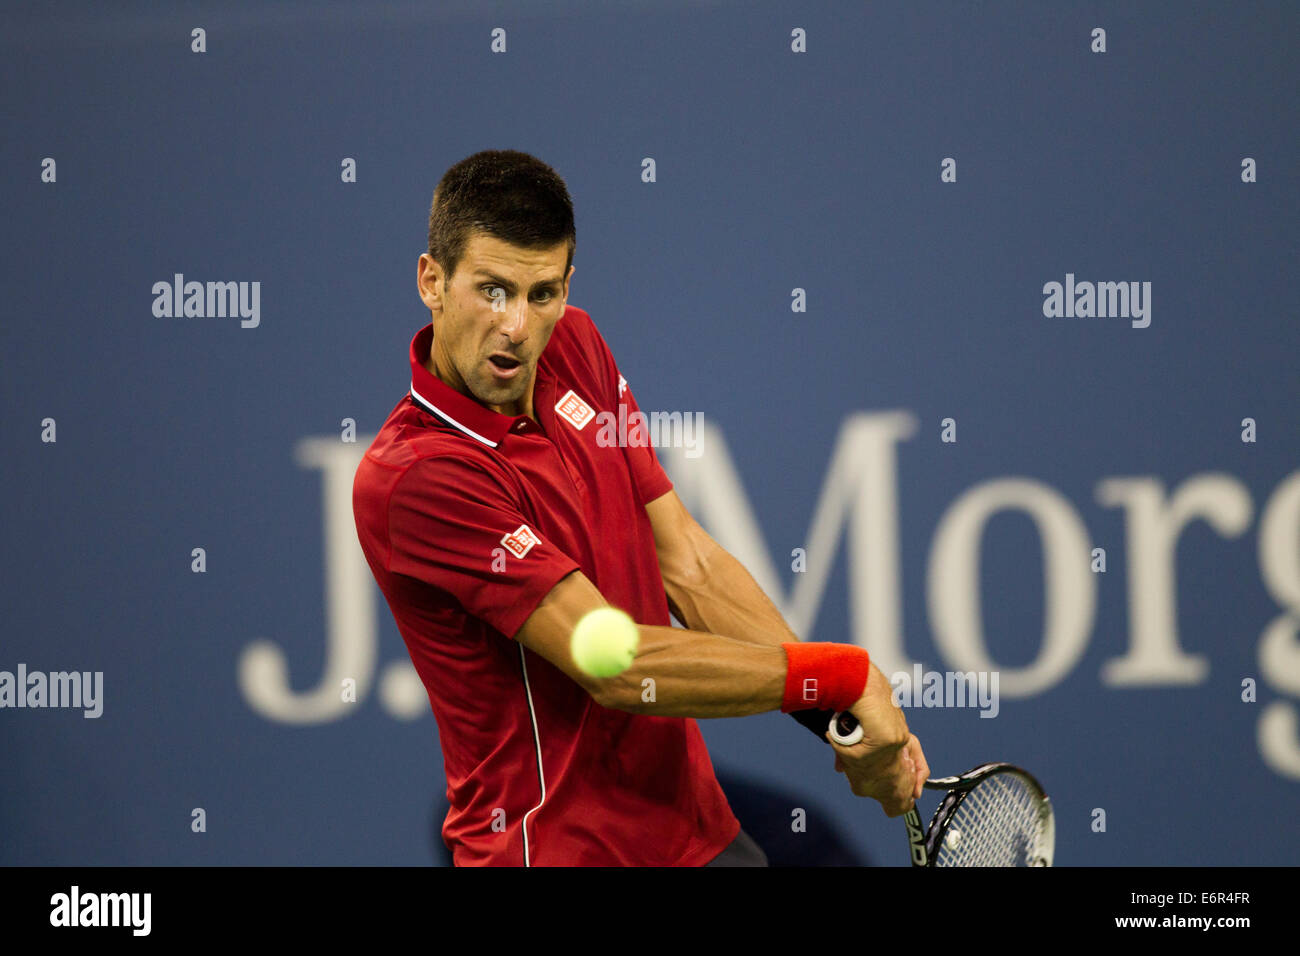 Flushing Meadows, NY, USA. 25th Aug, 2014. Novak Djokovic (SRB) in action against Diego Schwartzman (ARG) during - Stock Image